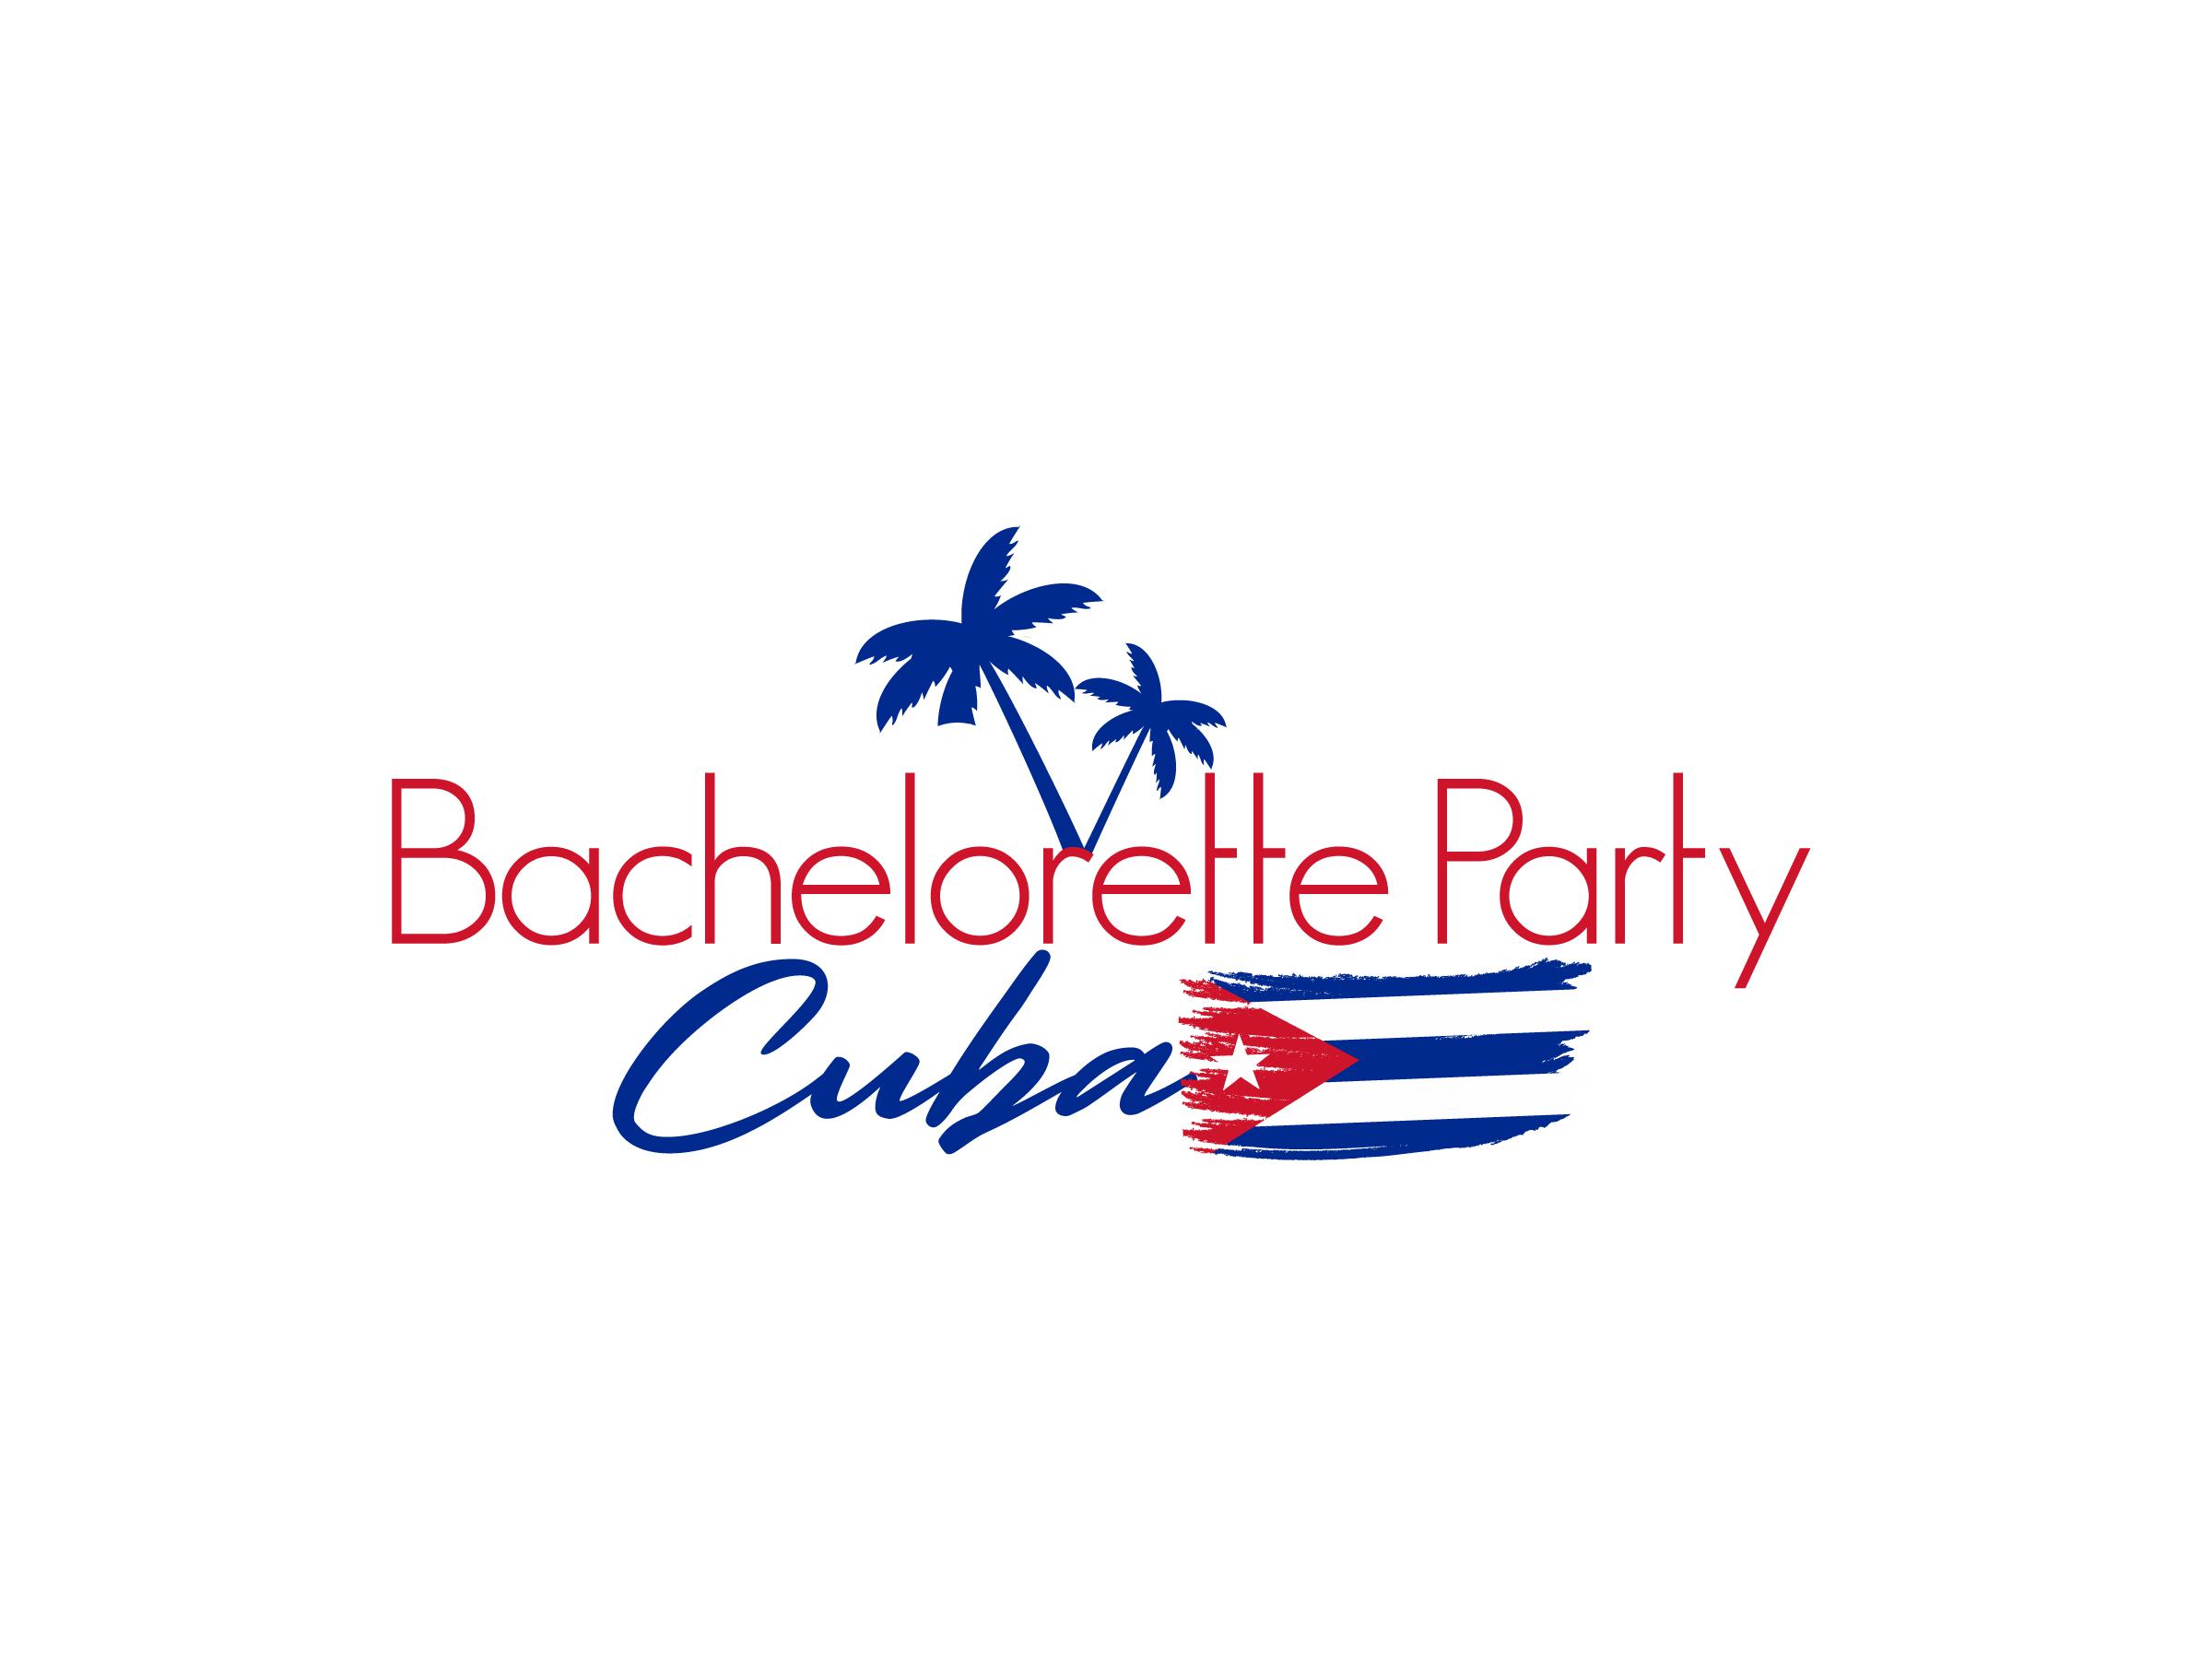 Bachelorette Party Cuba